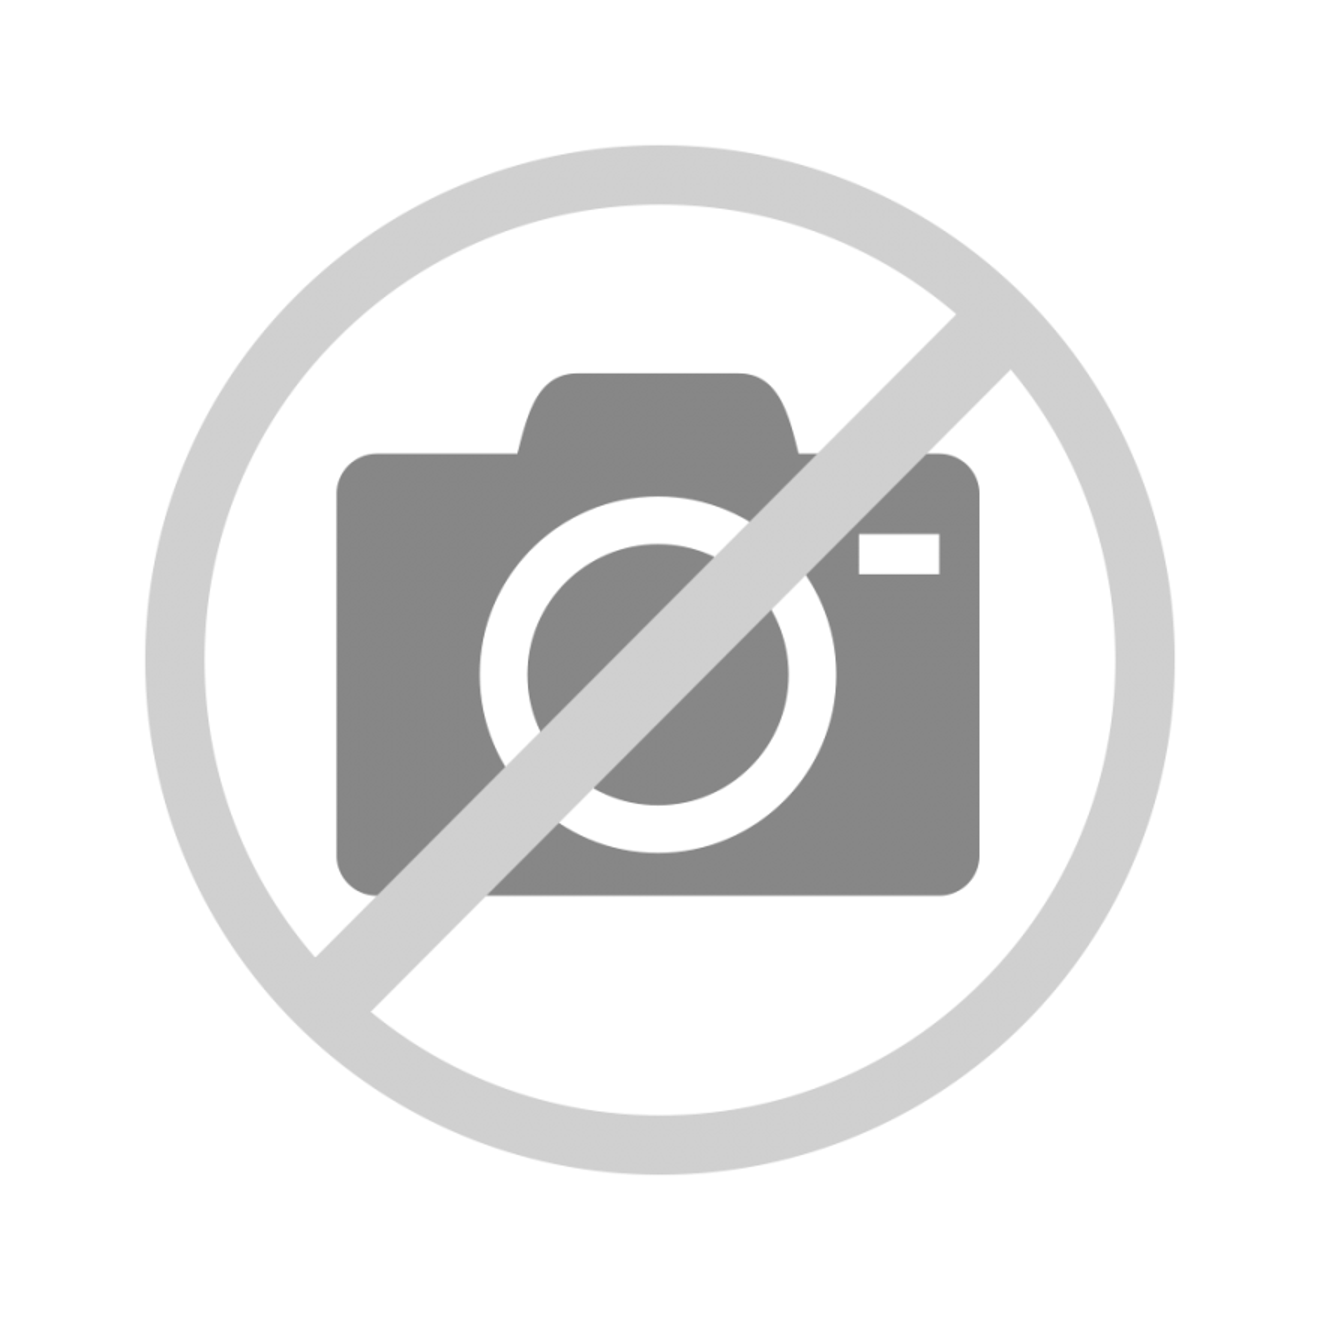 FTM Seika Massband Maßband 1,30m Fishing Tackle Max